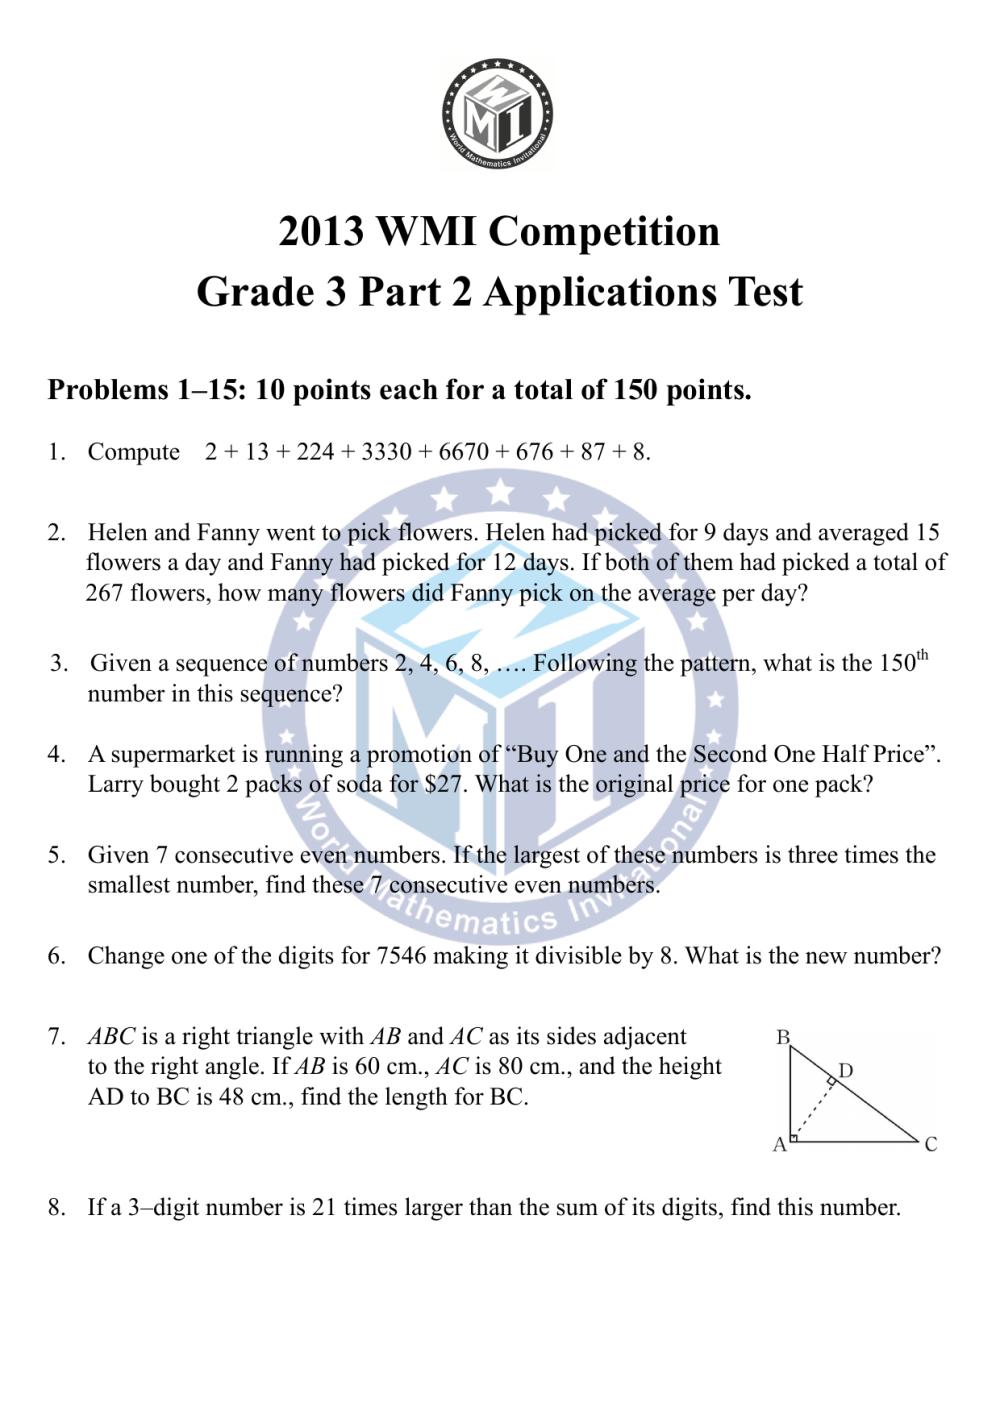 medium resolution of 2013 WMI Grade 3 Part 2 Questions